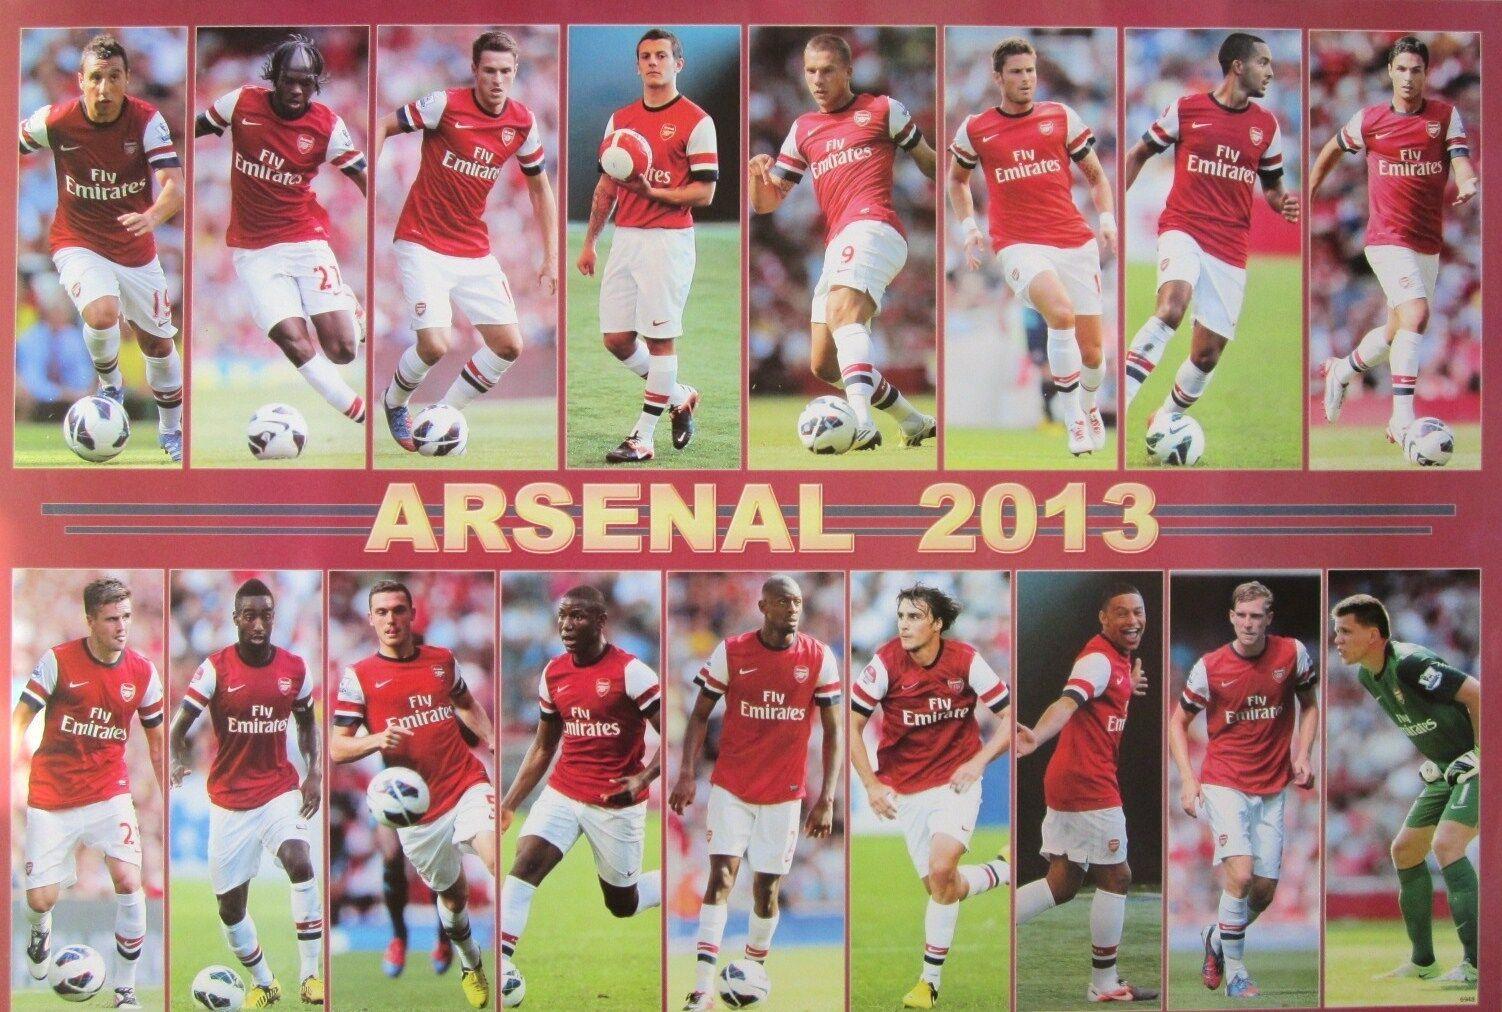 PES 2013 How to Create Arsenal Kit Home + Away Jerseys ... |Arsenal Gunners 2013